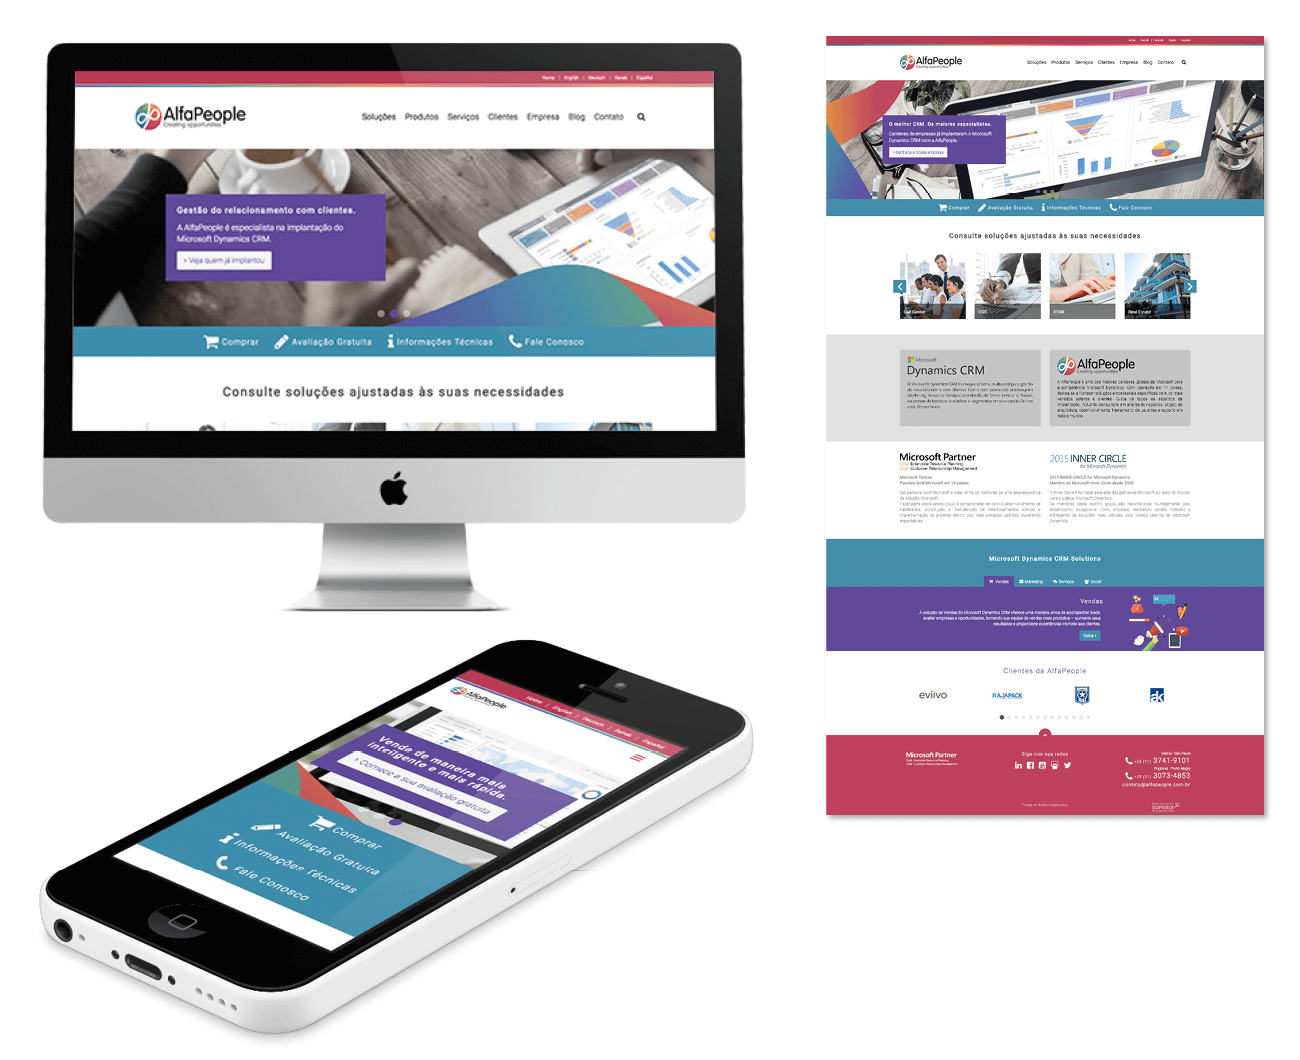 layout responsivo do site alfapeople mutinacional de software para crm